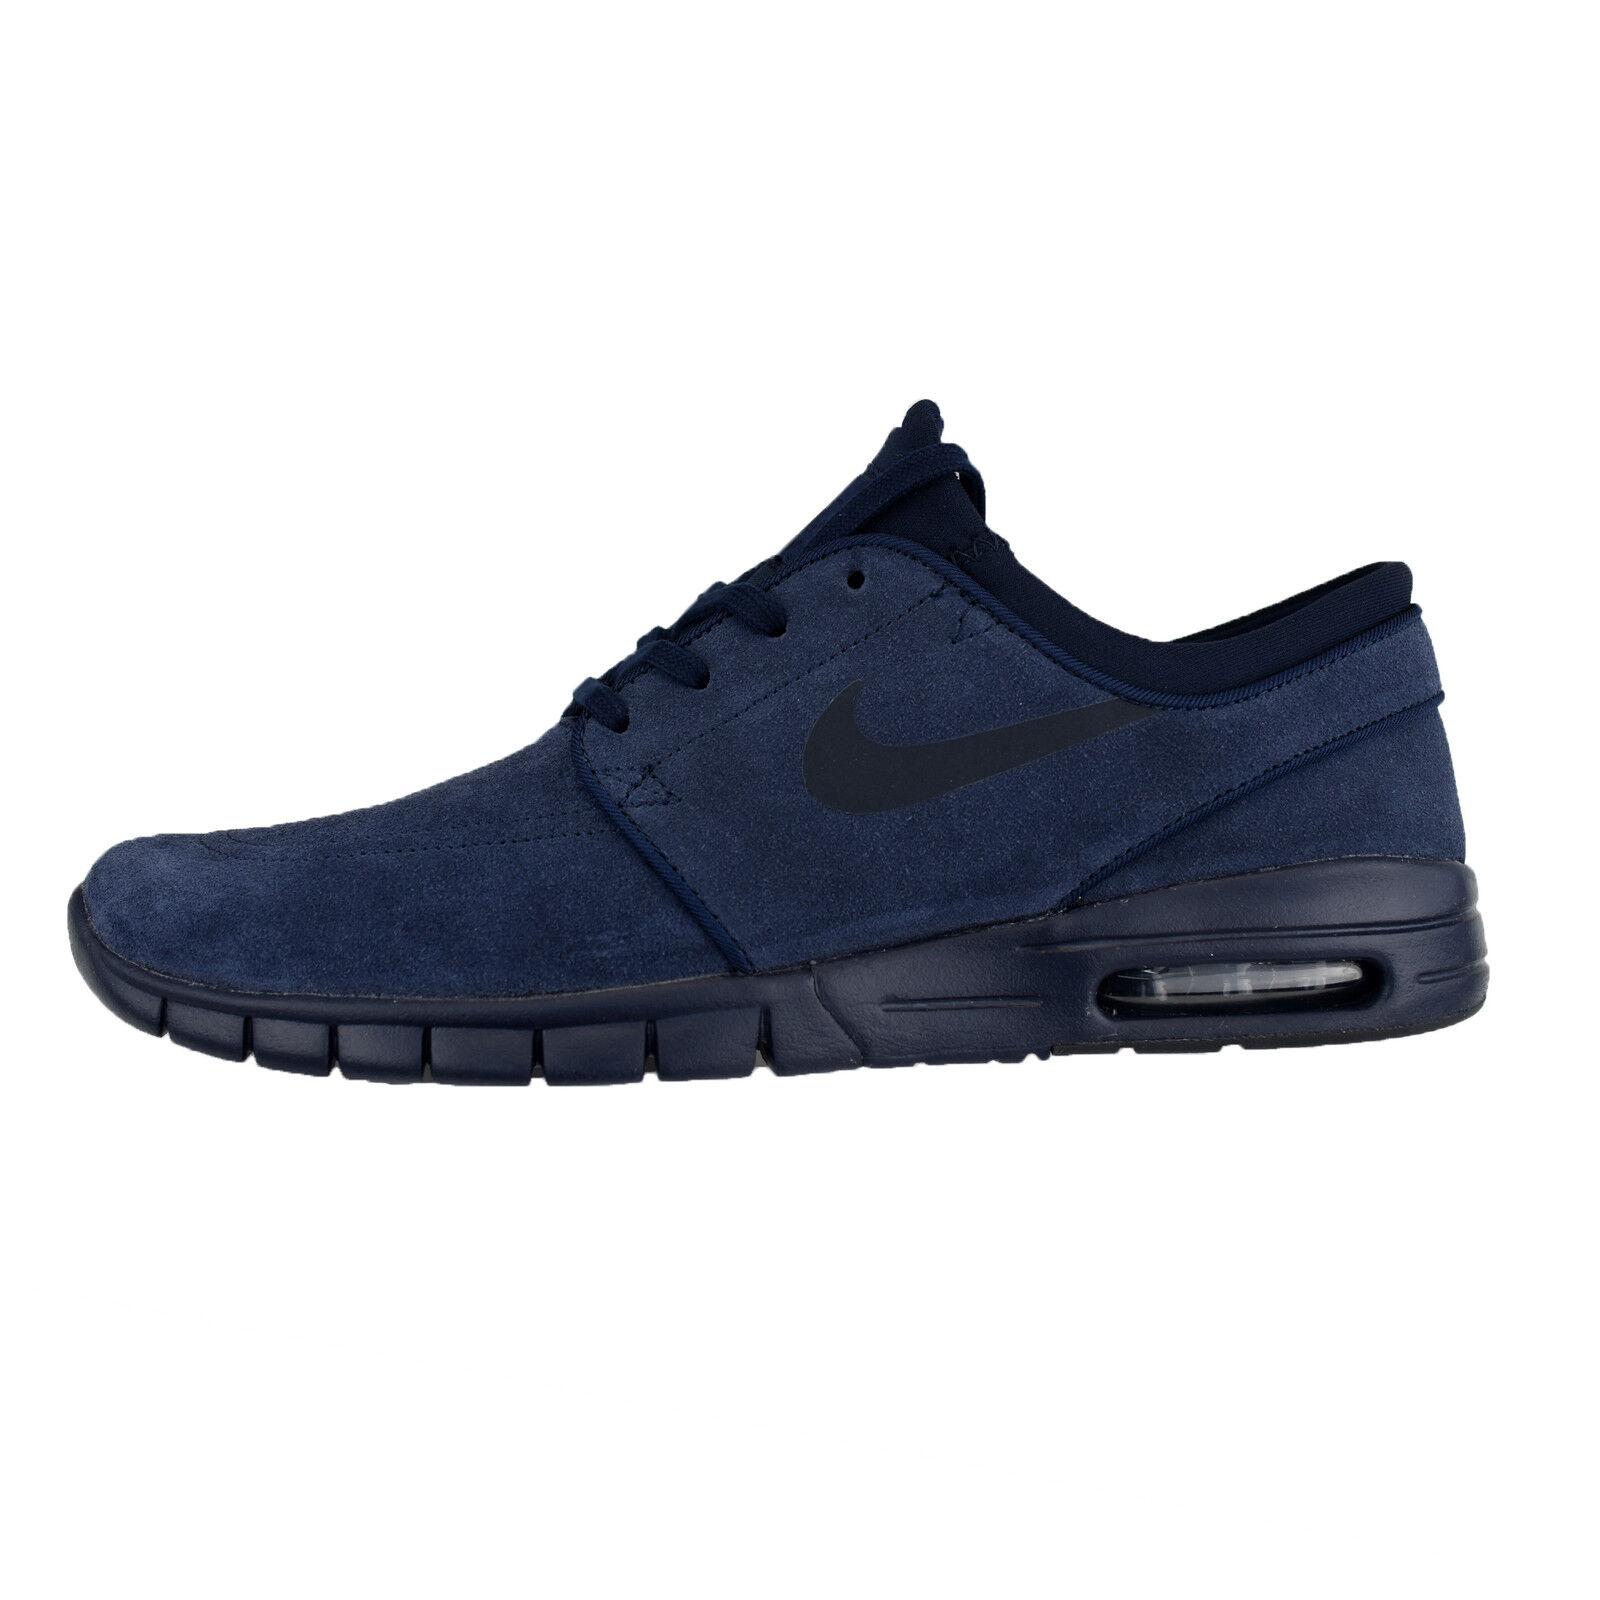 Nike Zoom Stefan Janoski MAX 685299-440 Skateboard Lifestyle Schuh Sneaker